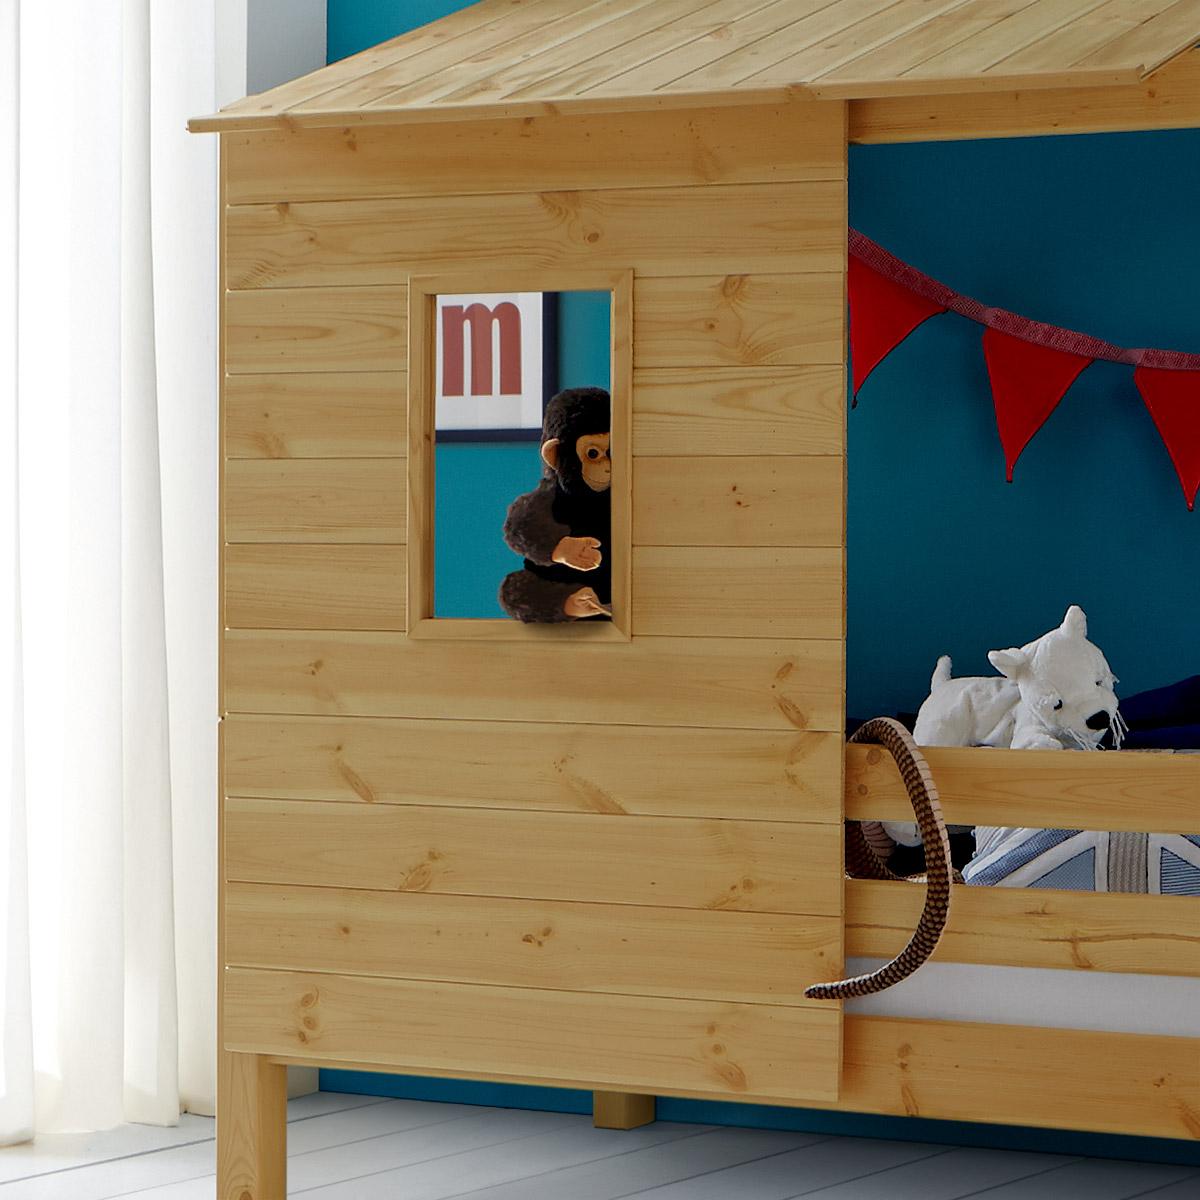 abenteuerbett mit spielhaus aus holz kids paradise. Black Bedroom Furniture Sets. Home Design Ideas